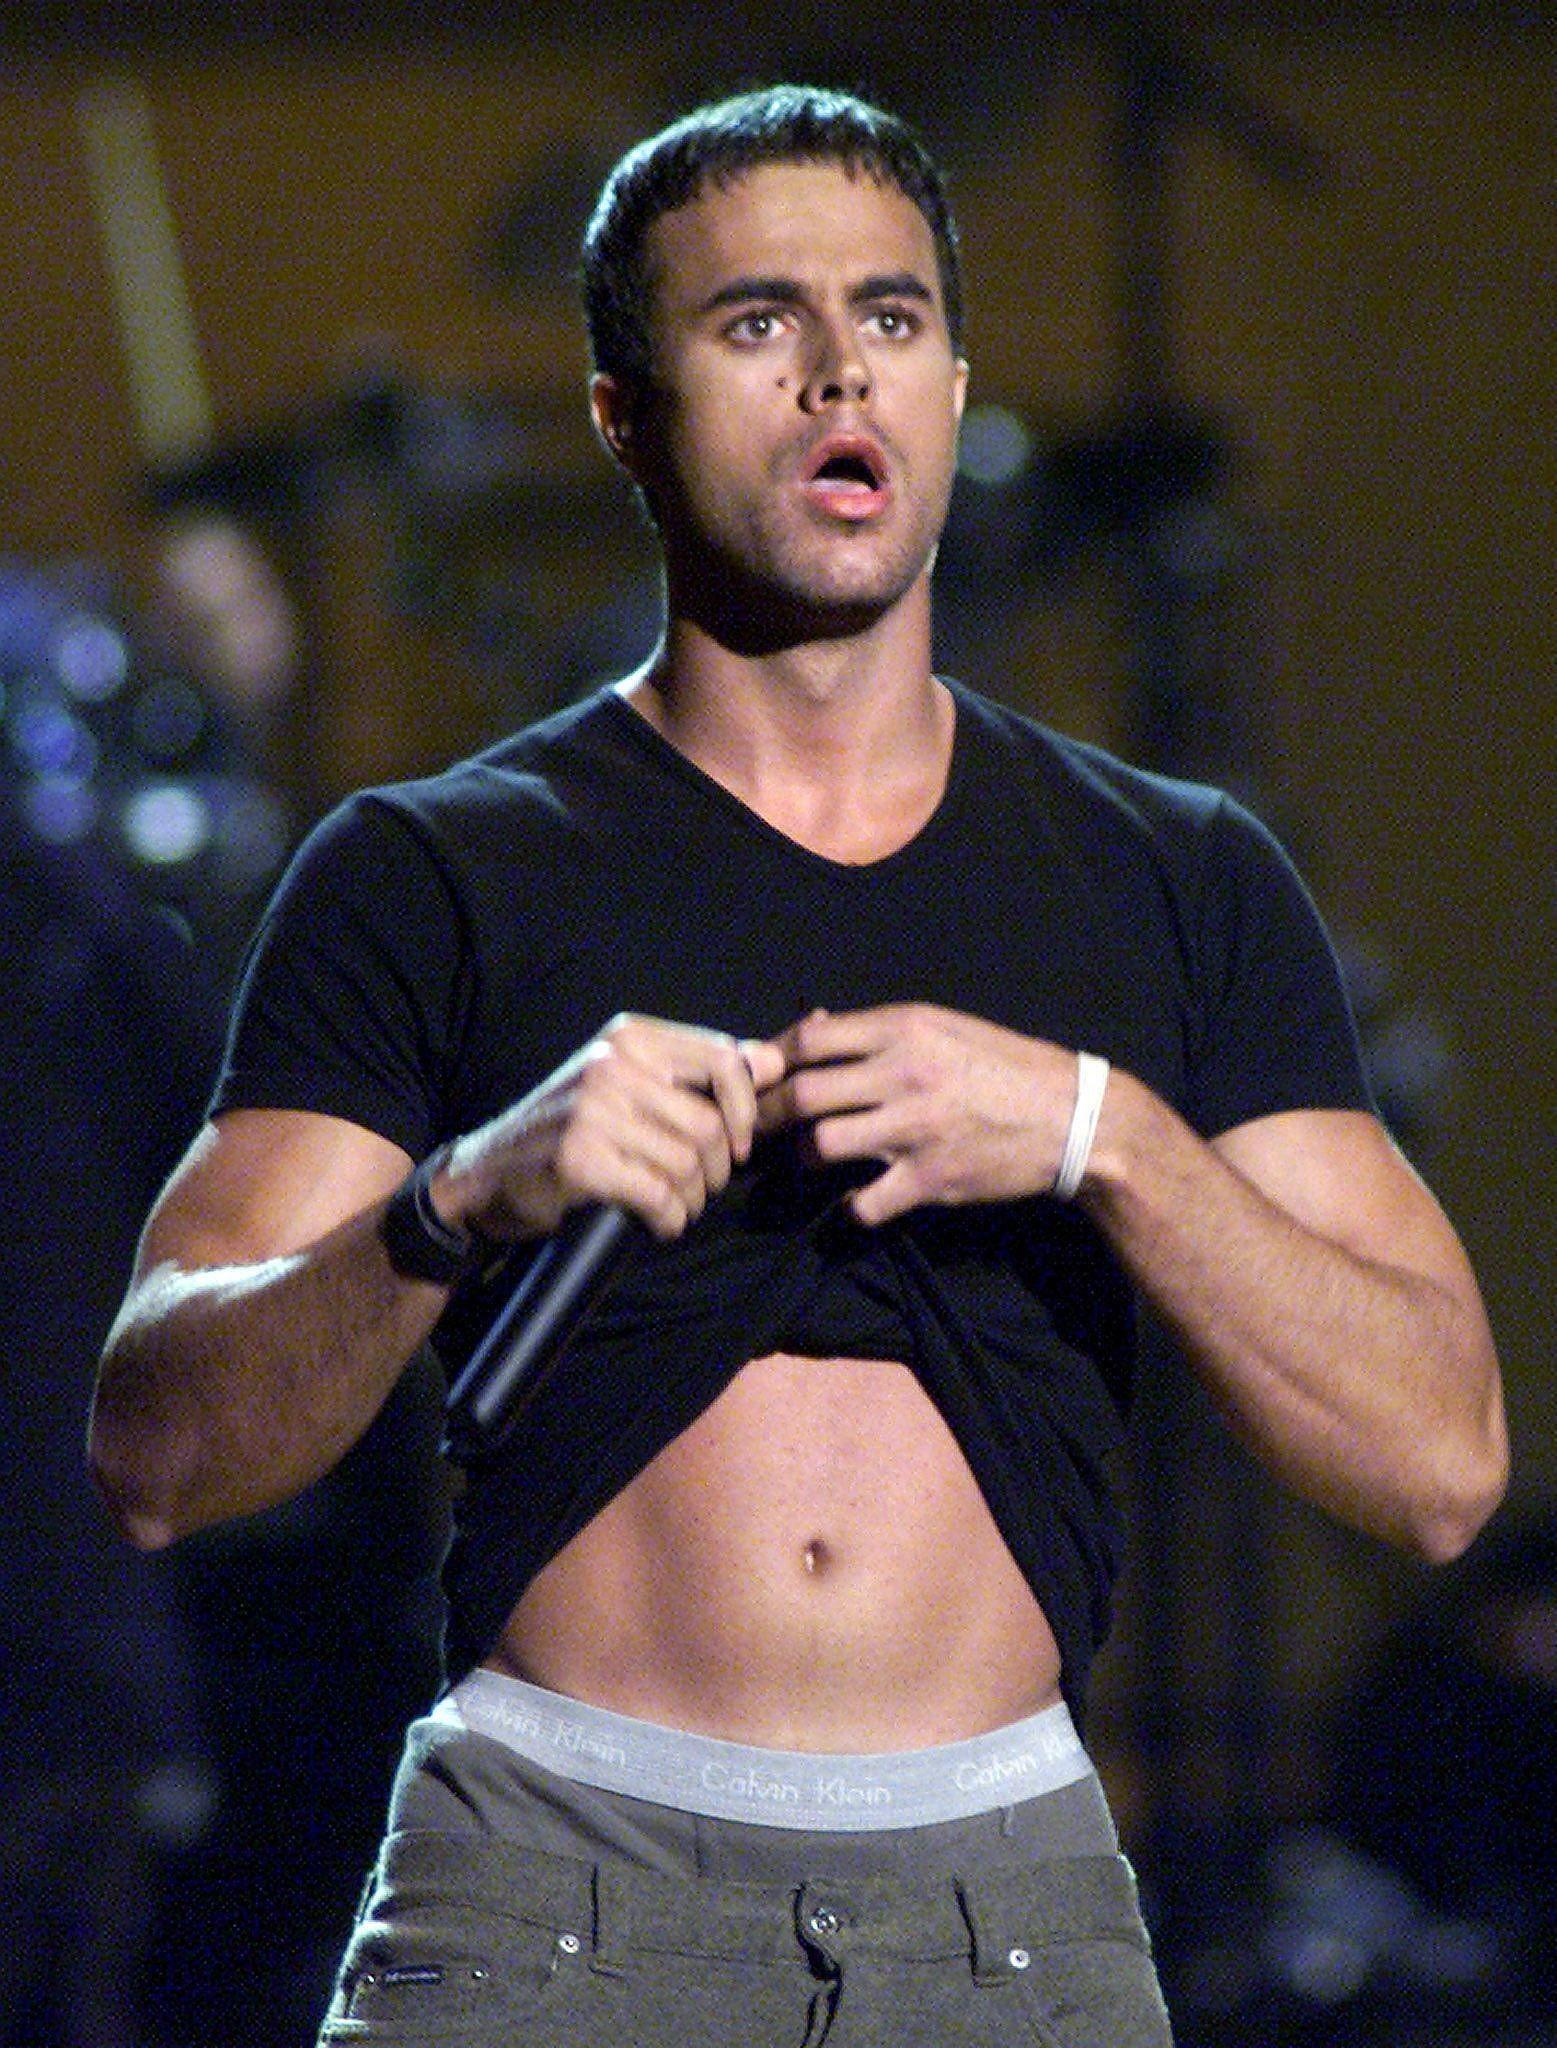 Enrique Iglesias onstage lifting his shirt